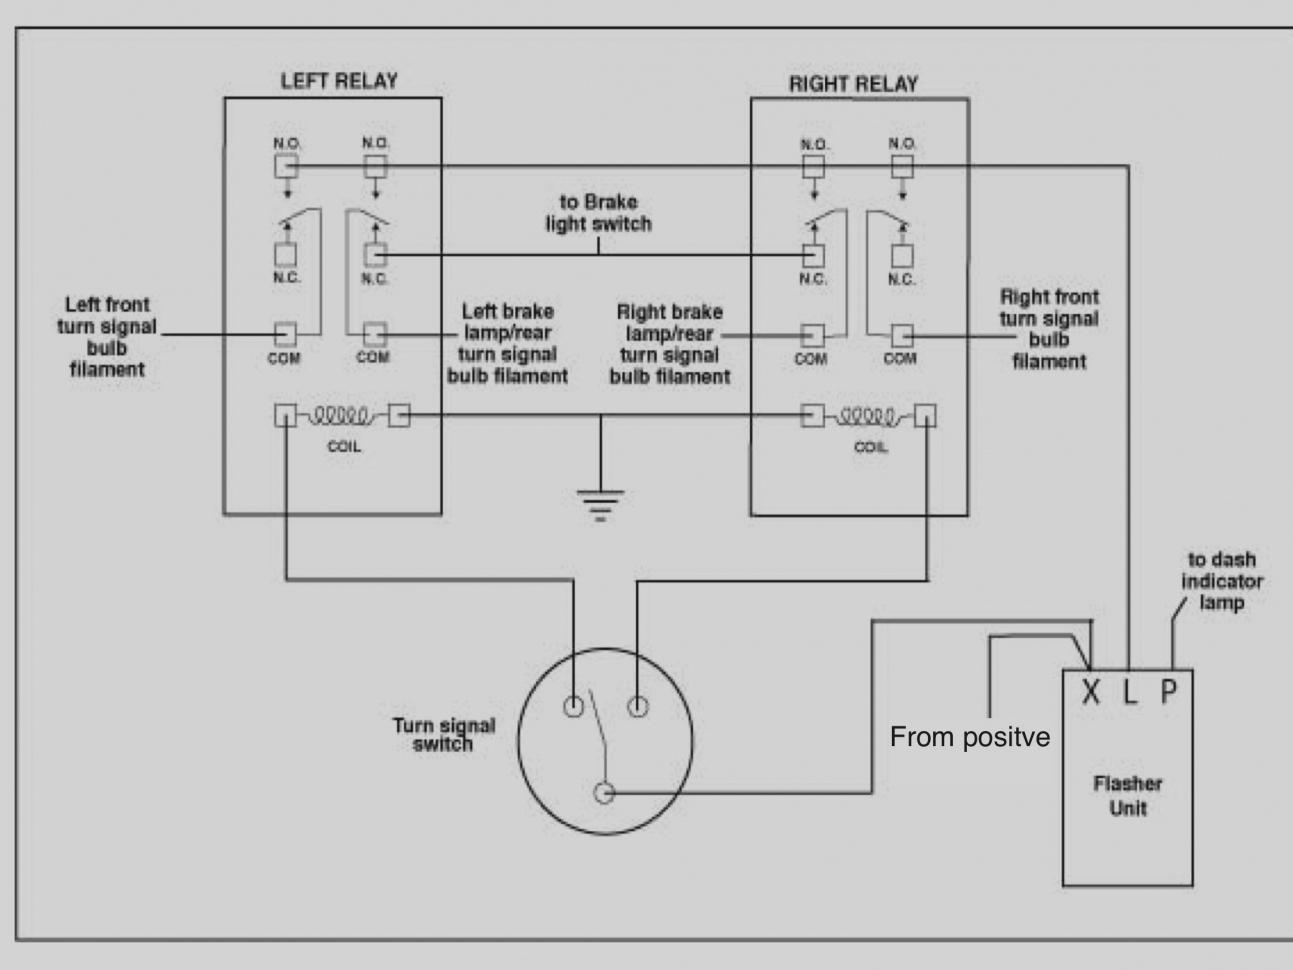 Rzr 800 Wiring Diagram Wiring Diagram